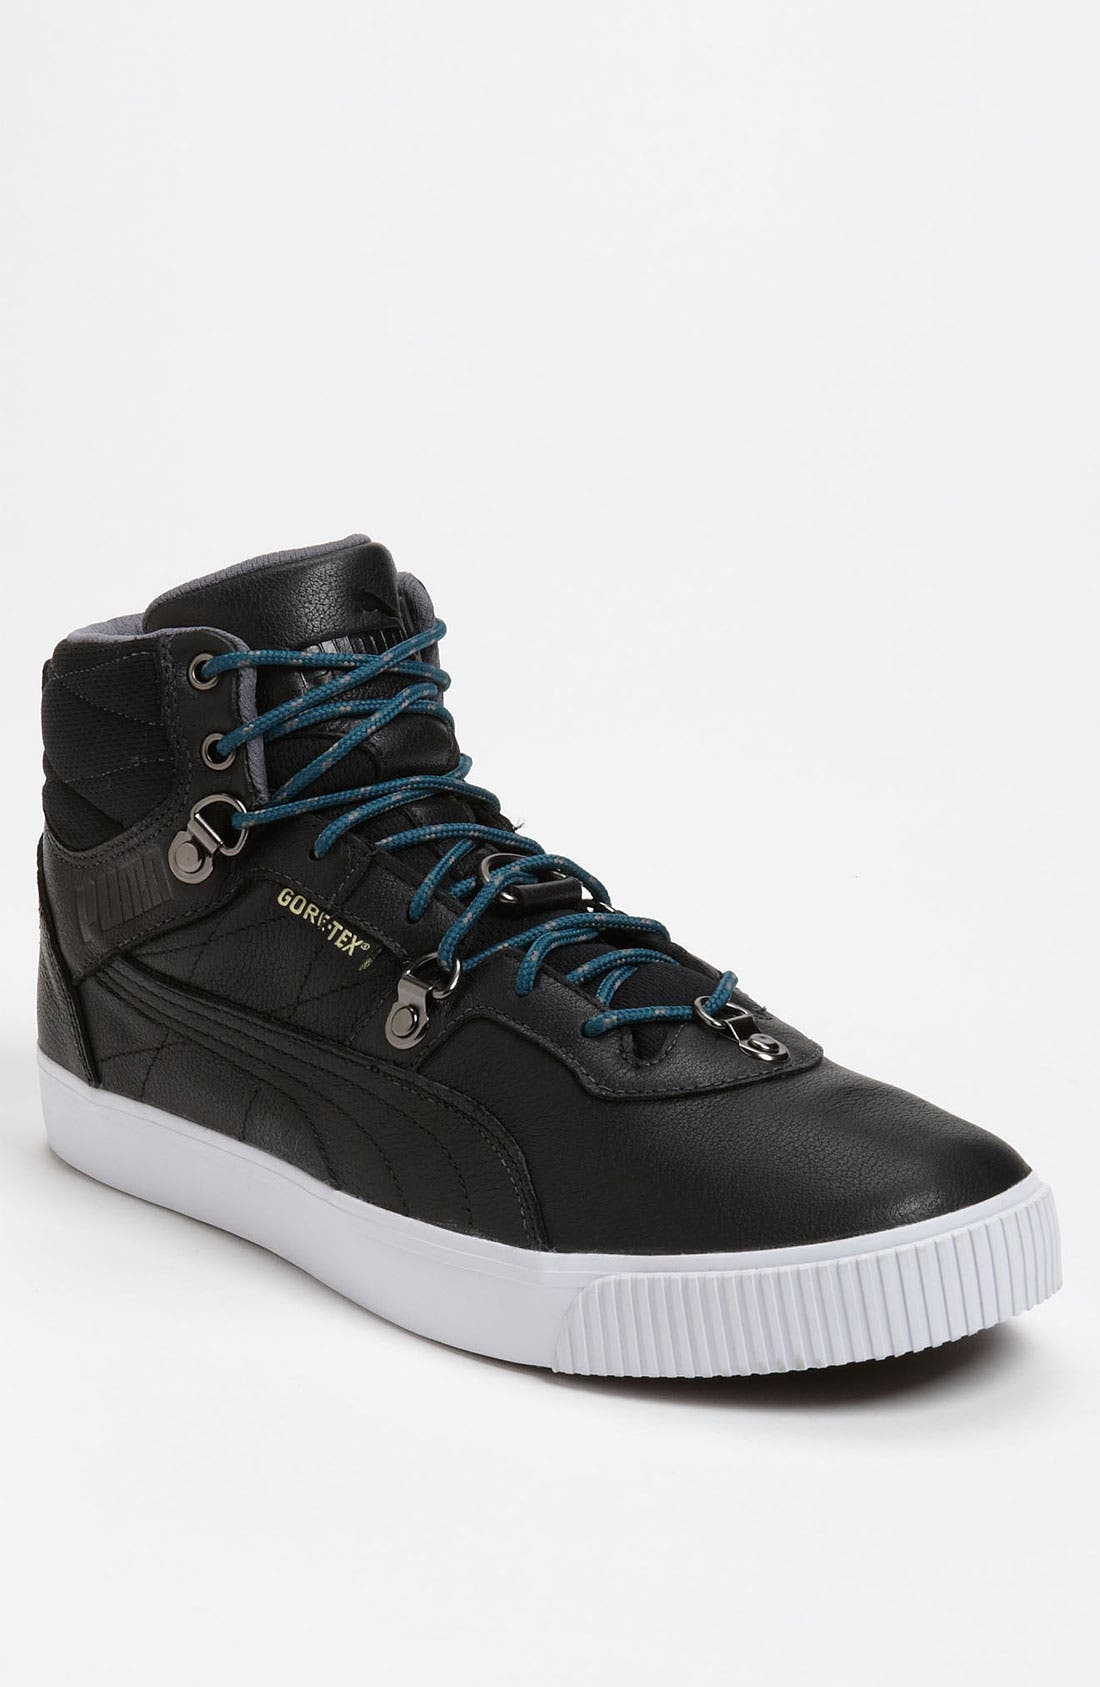 Main Image - PUMA 'Tipton GTX' Sneaker (Men) (Online Exclusive)